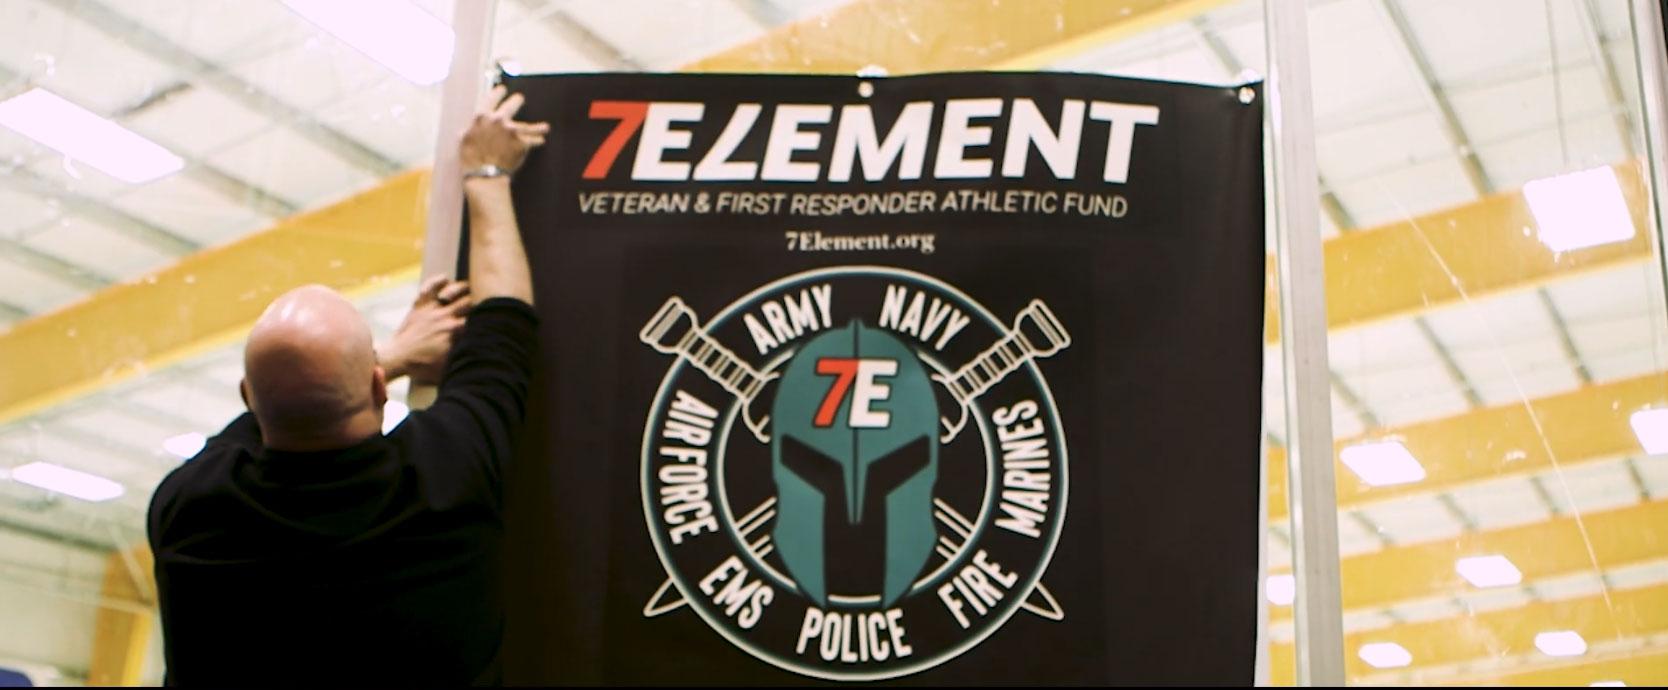 7 Element logo on a banner